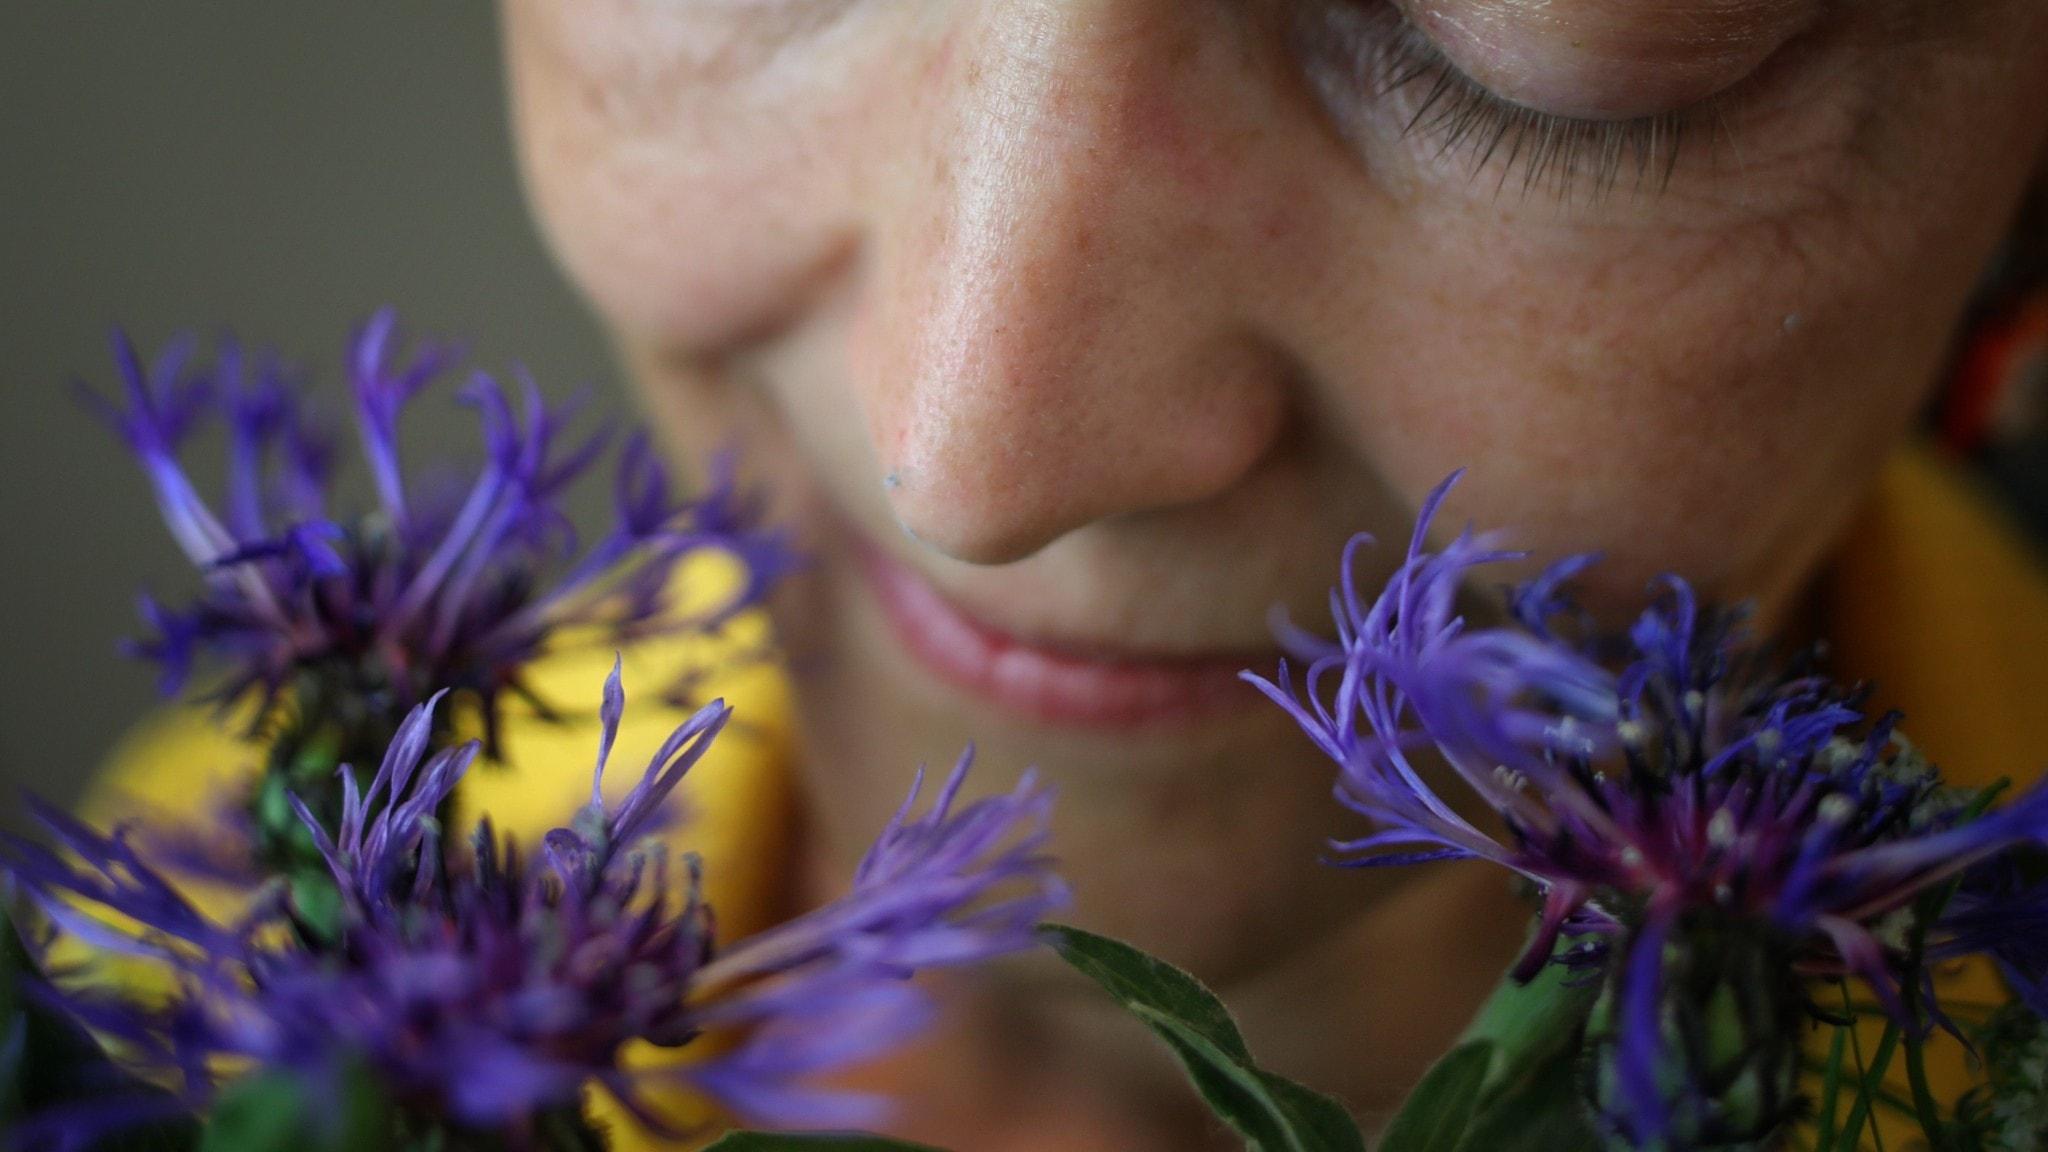 Kvinna luktar på blommor.